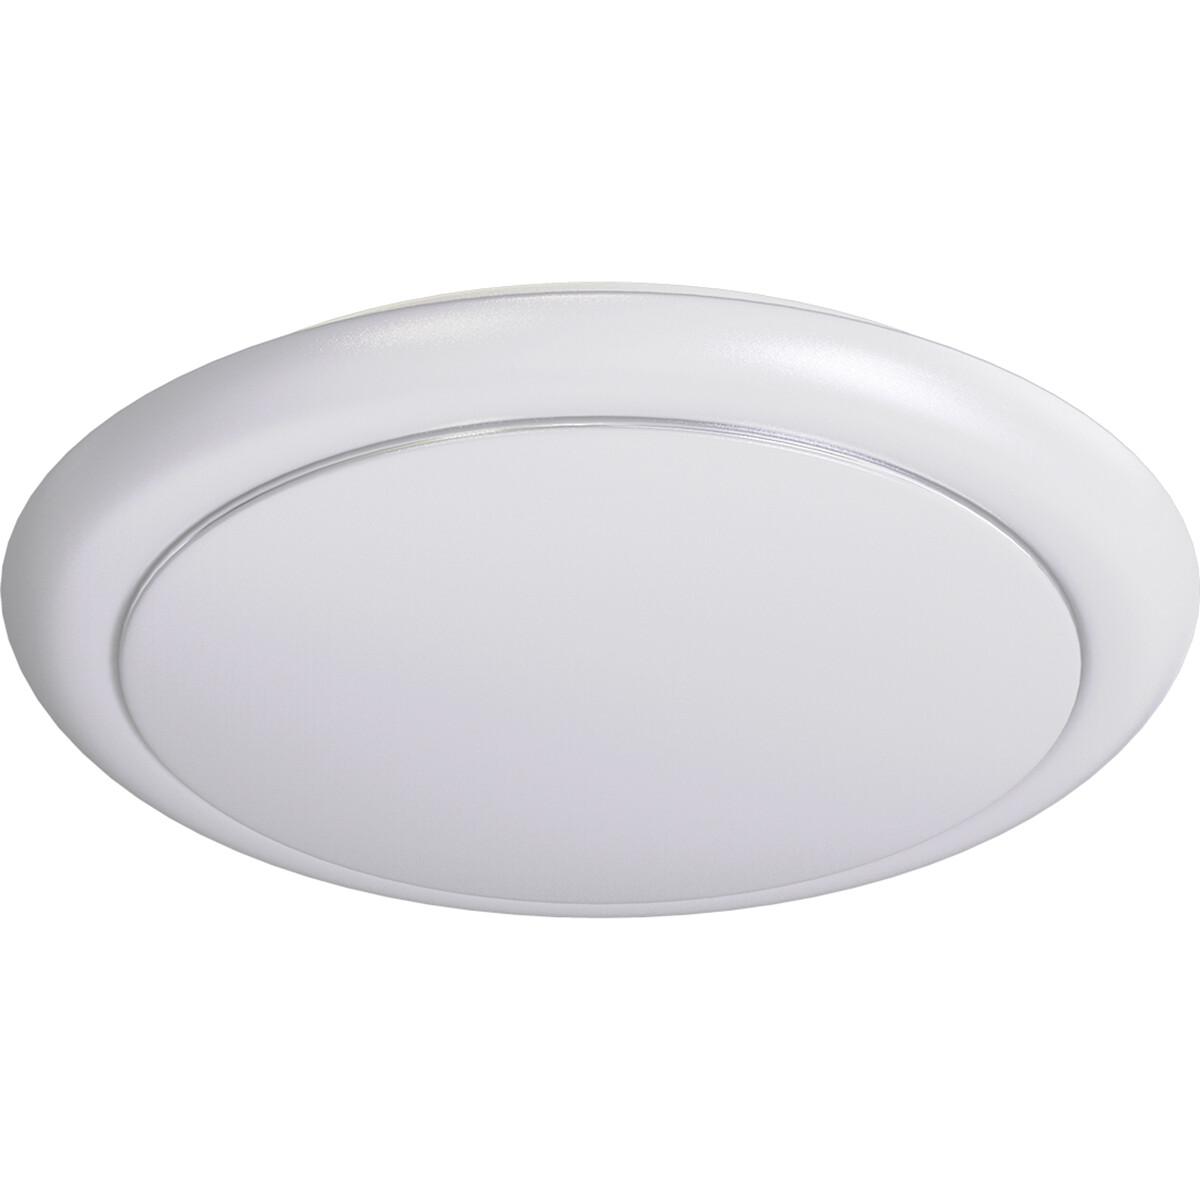 LED Plafondlamp - Aigi Ala - Opbouw Rond 24W - Helder/Koud Wit 6500K - Mat Wit - Aluminium